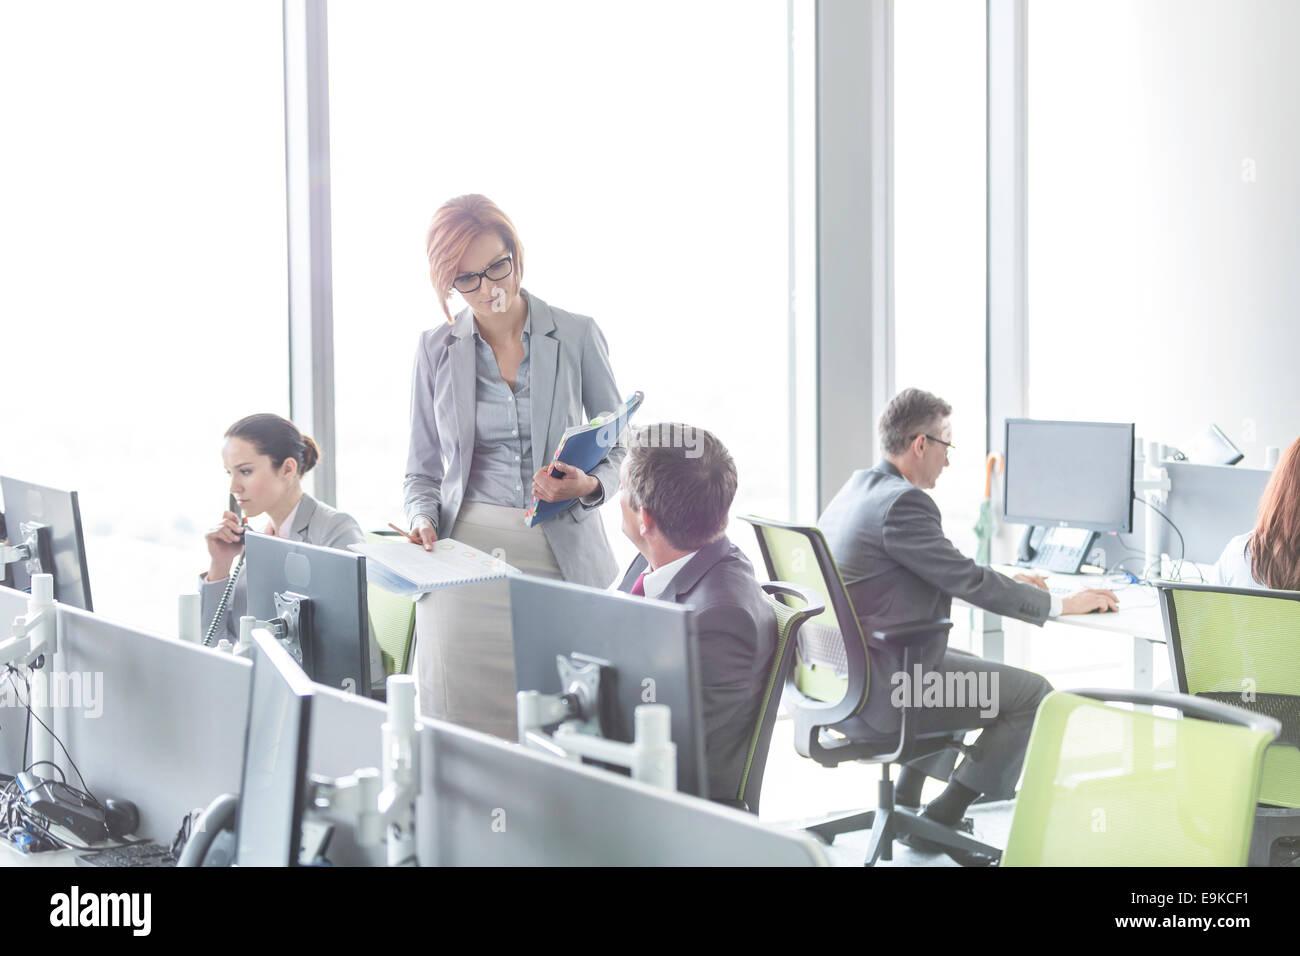 Geschäftsleute im Großraumbüro Stockbild